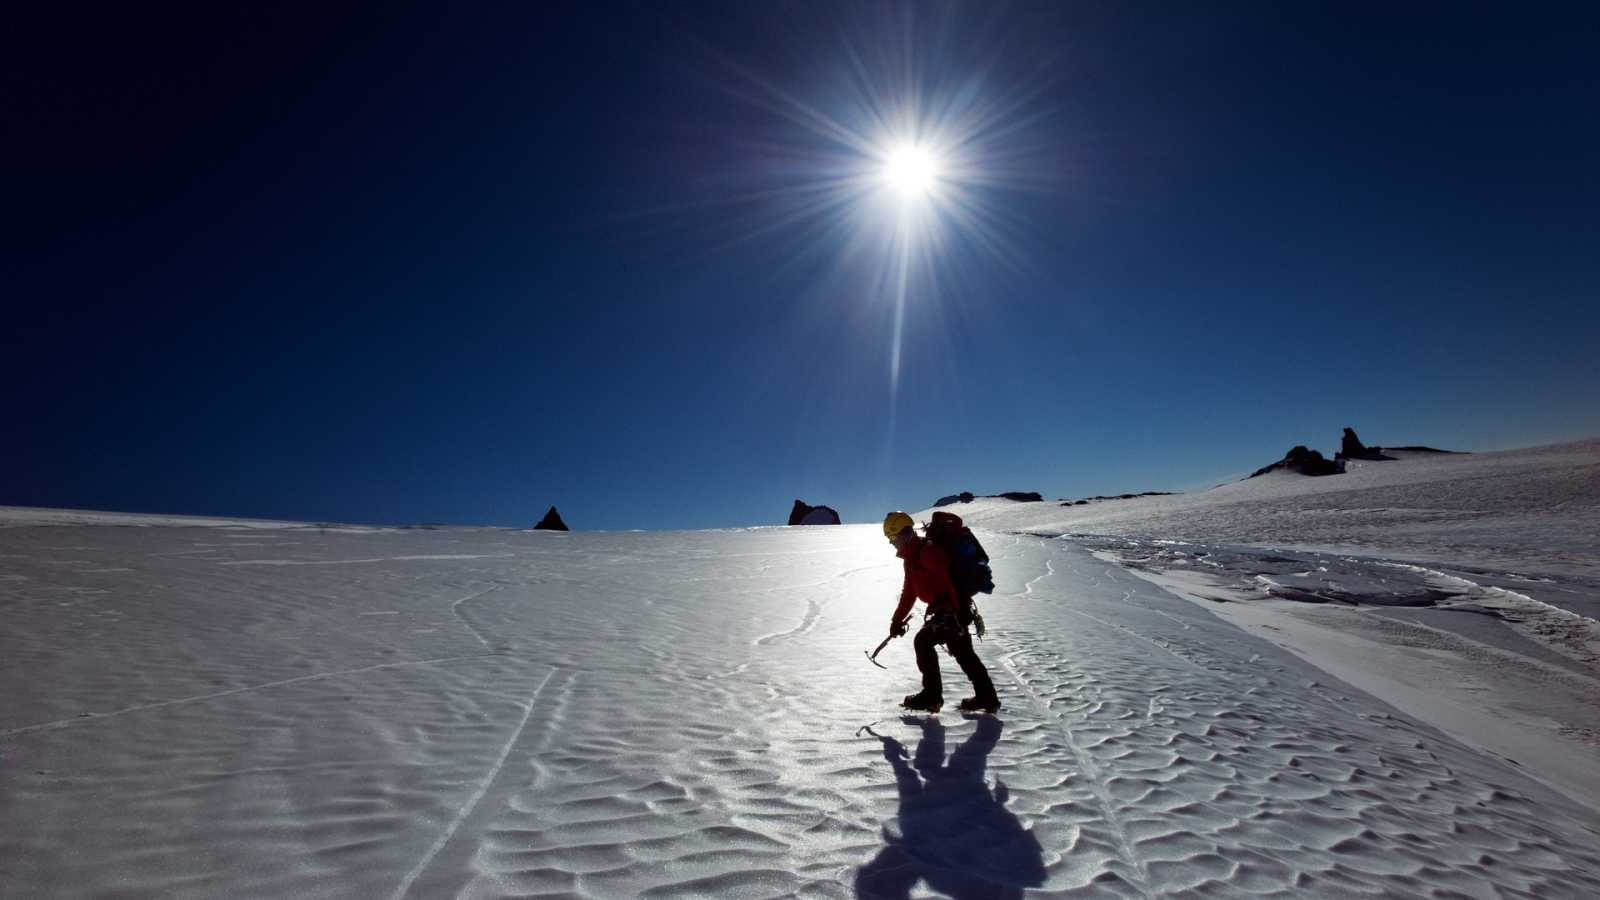 Memoria de delfín - Polo Sur: la conquista de Roald Amundsen - 11/07/20 - escuchar ahora